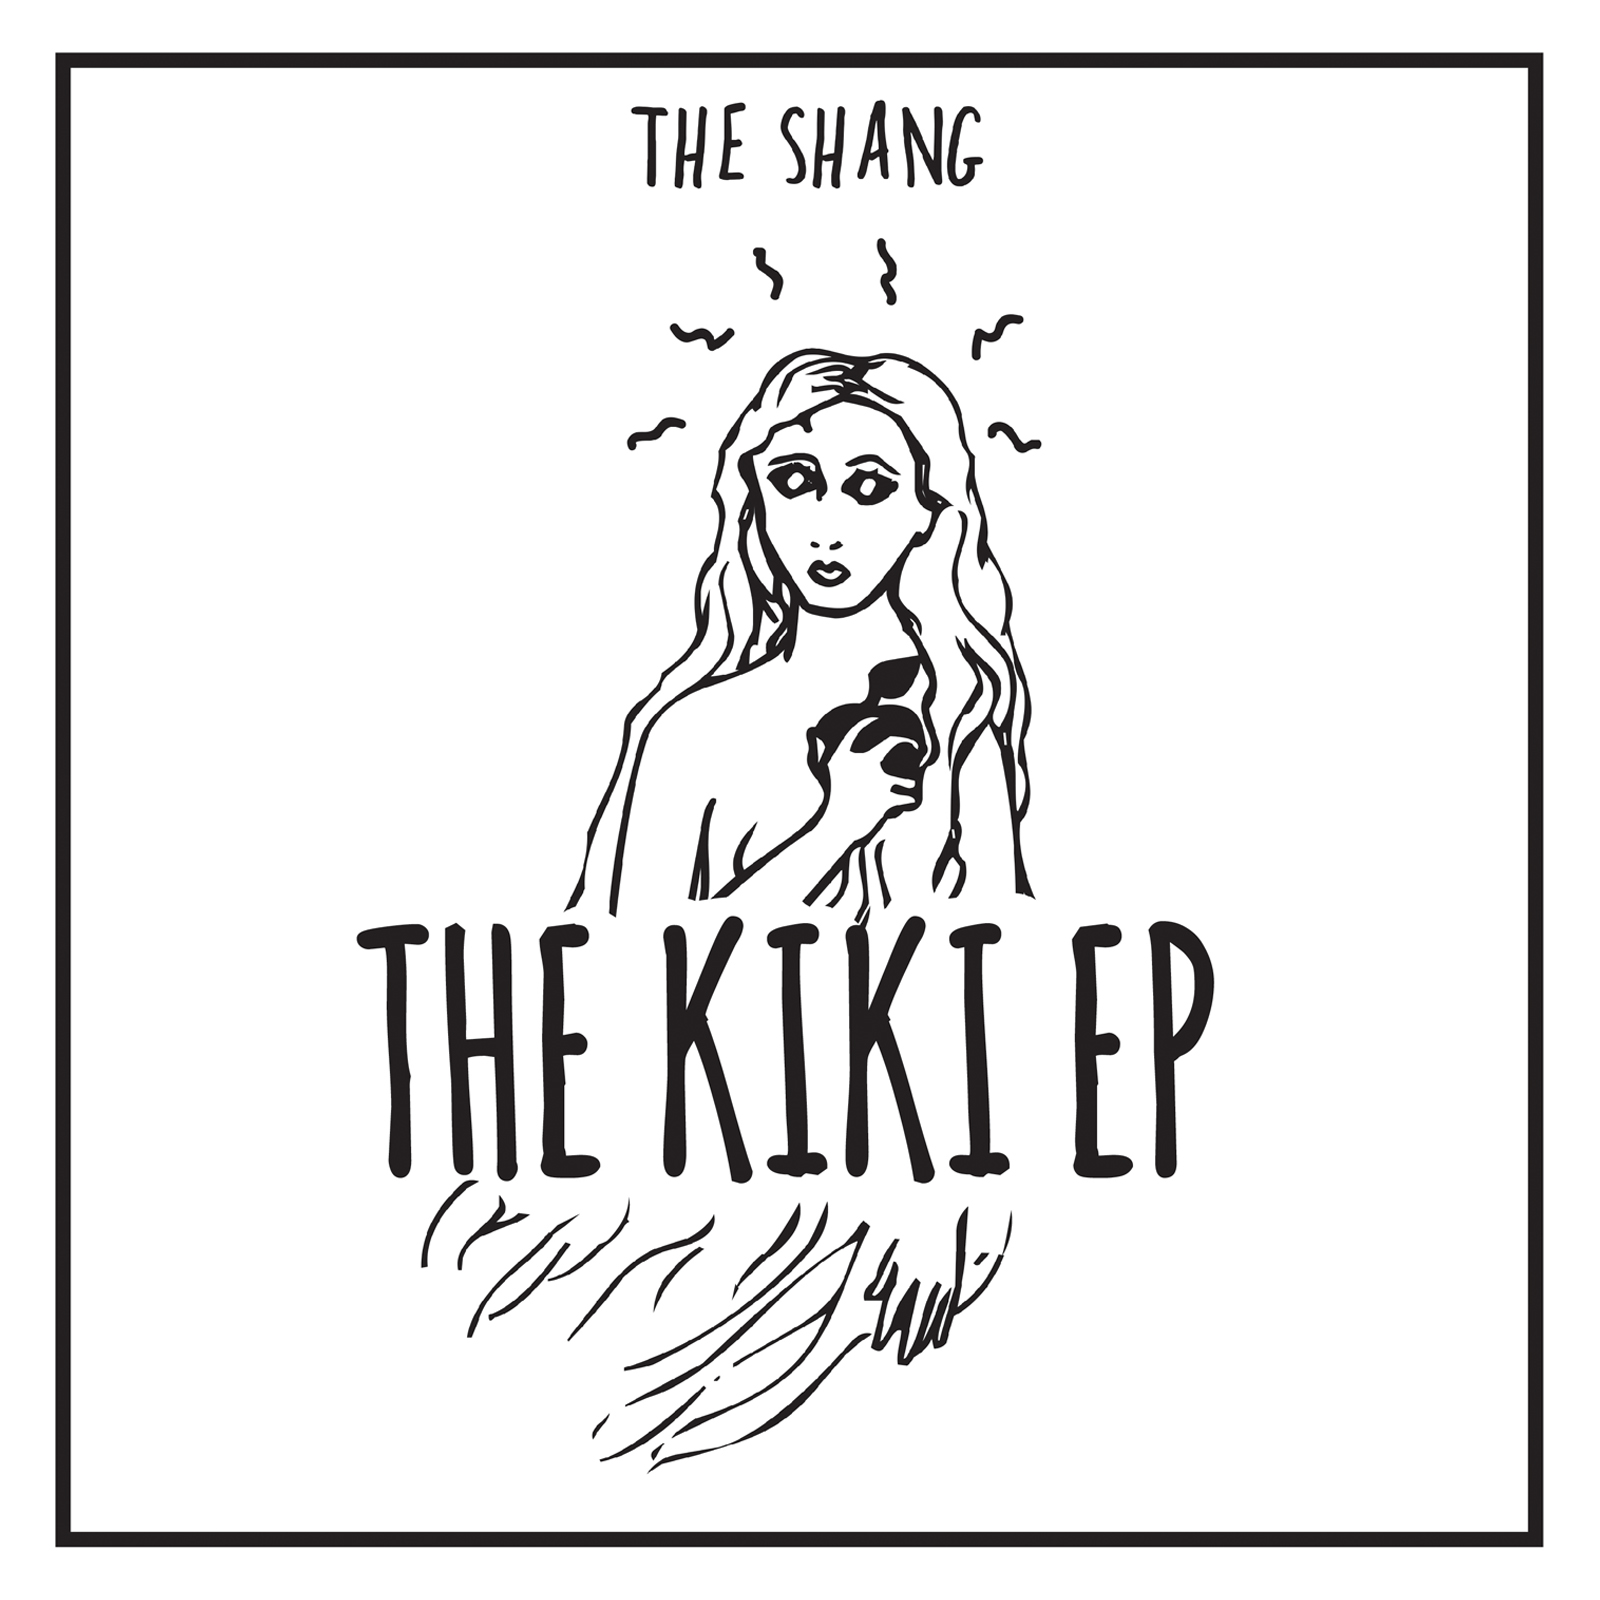 THE KIKI EP